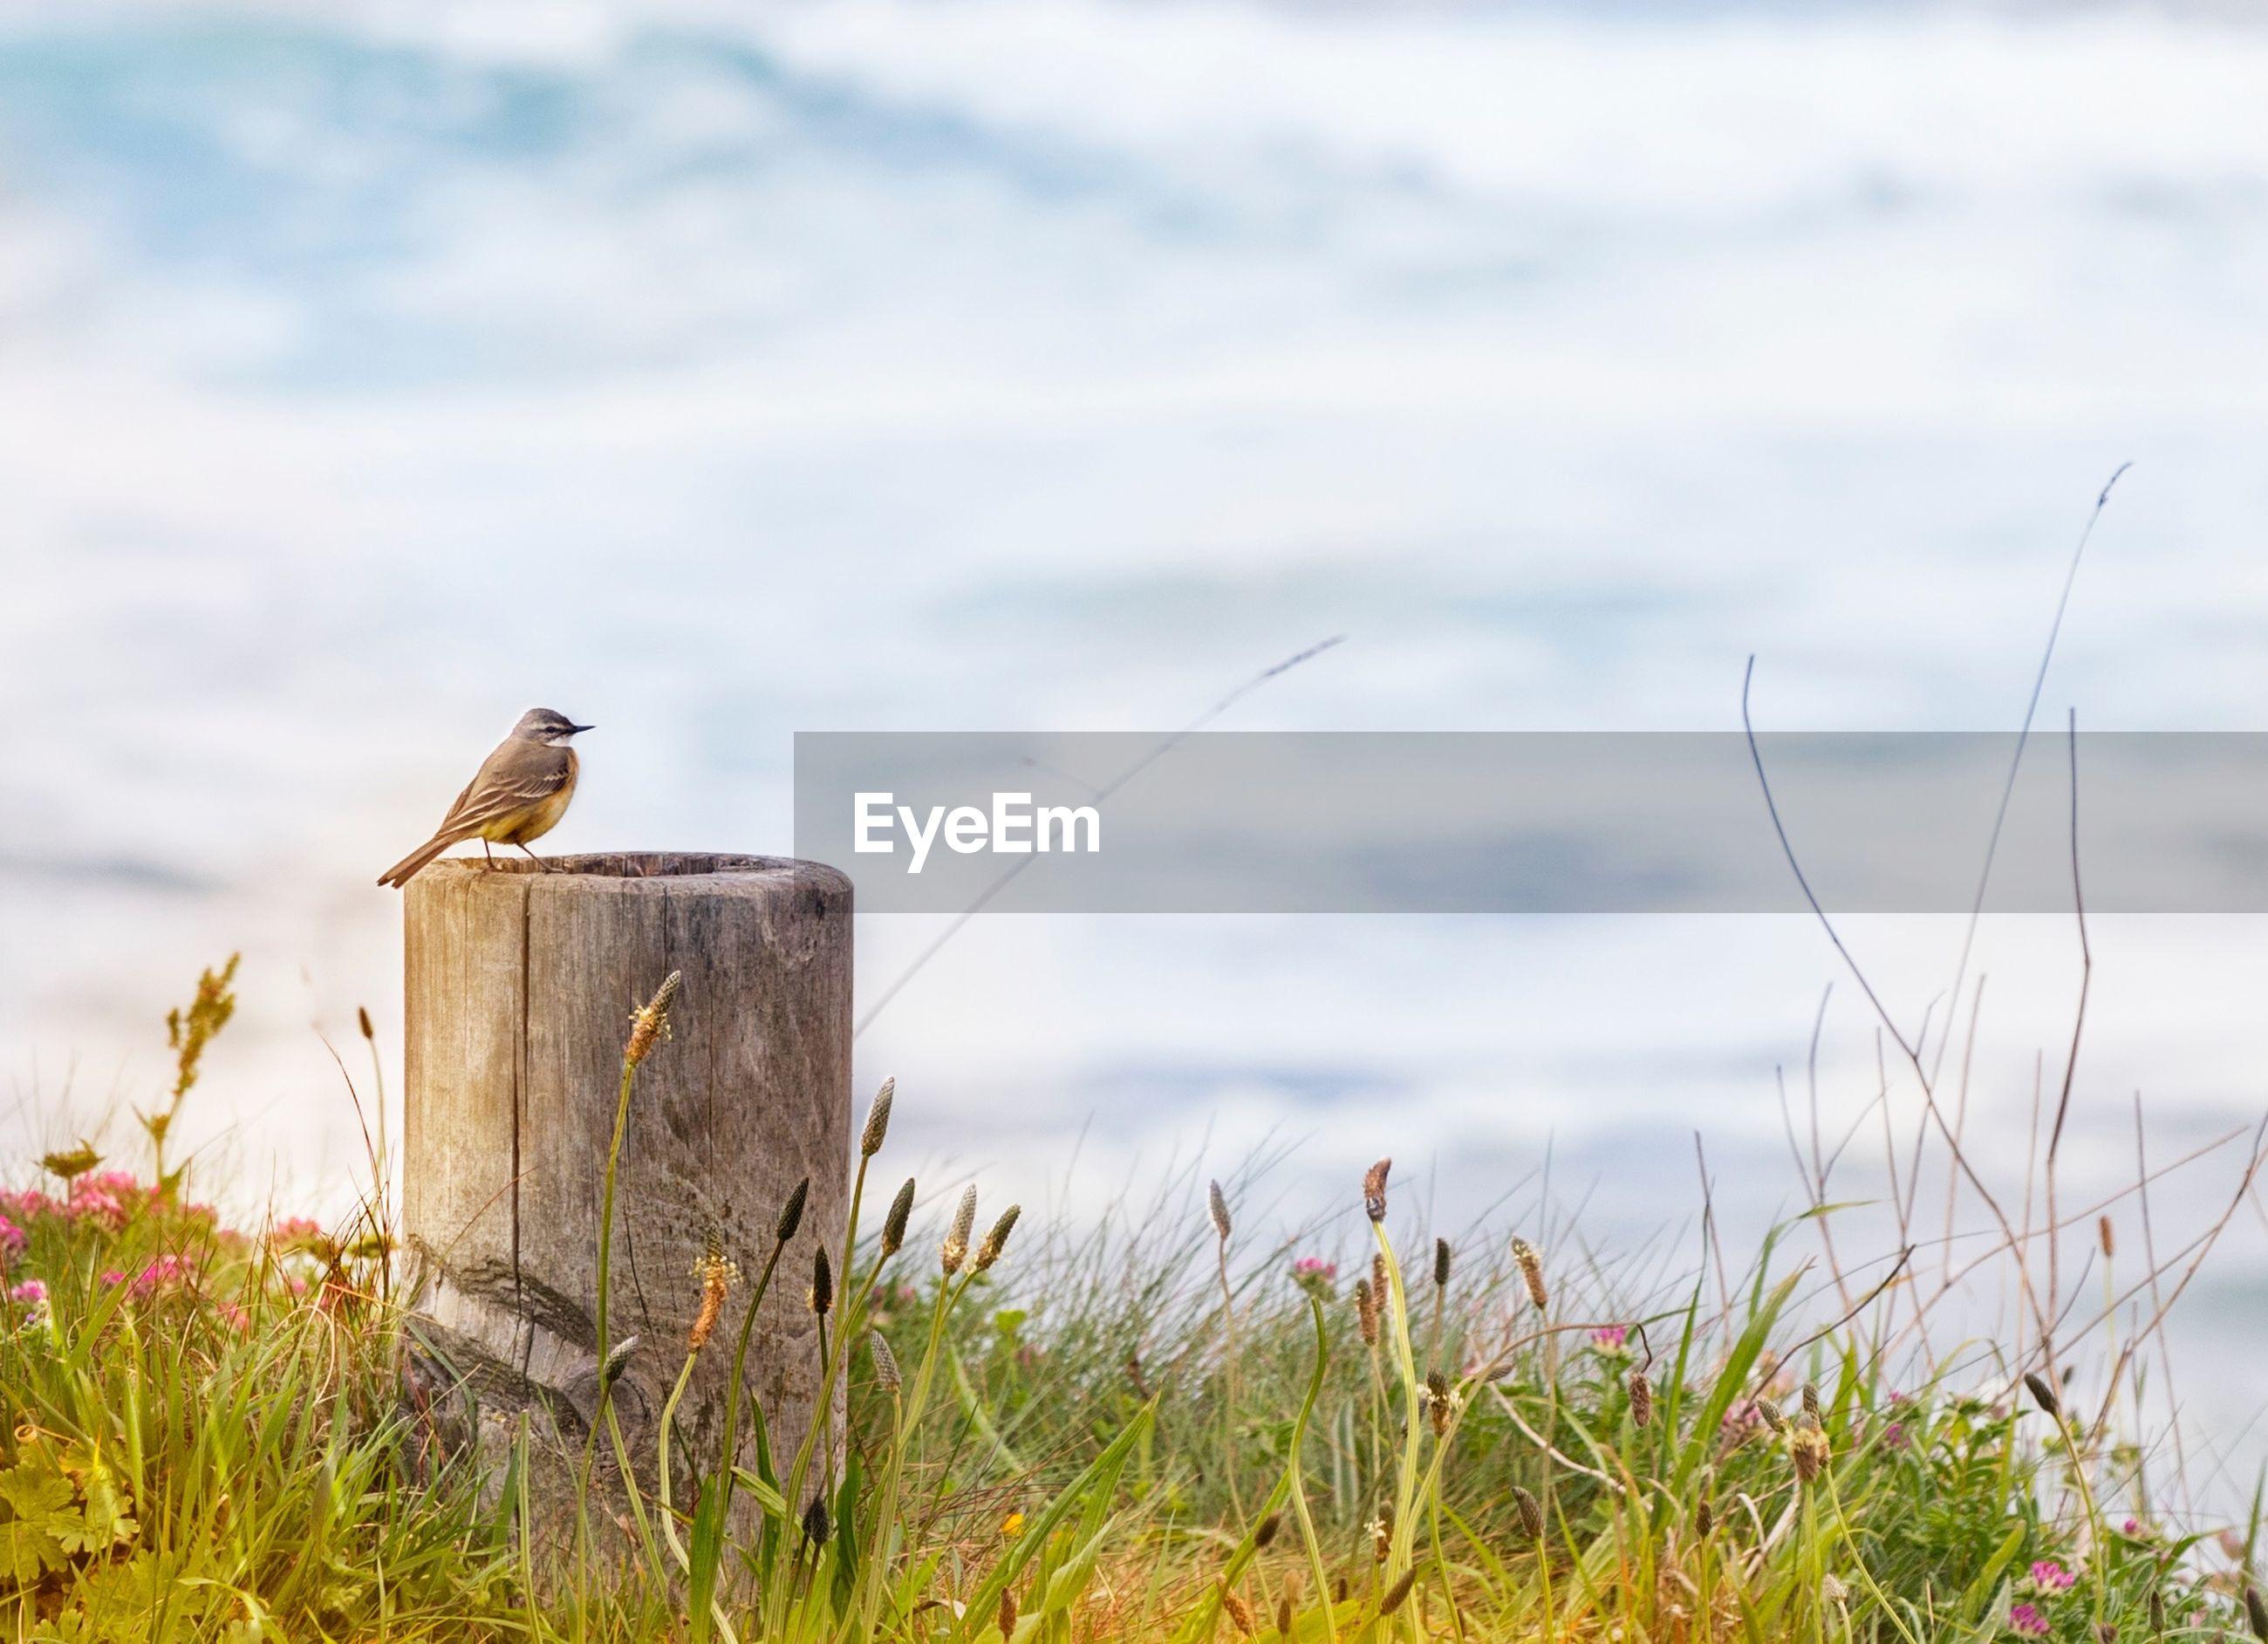 Bird perching on wooden post in field against sky